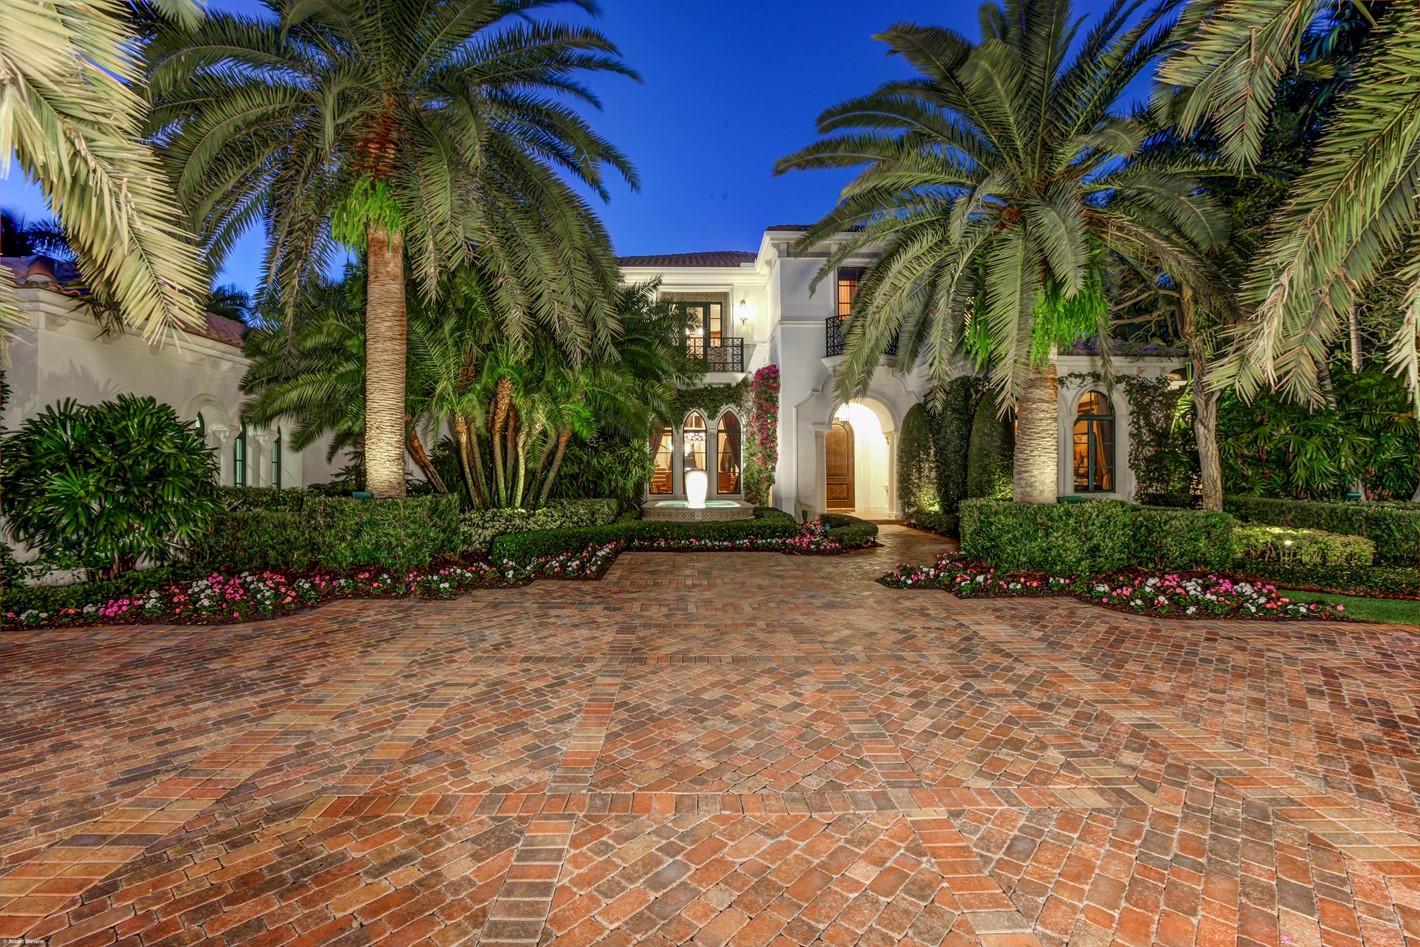 11703 San Sovino Court, Palm Beach Gardens MLS Listing RX-10090822 ...